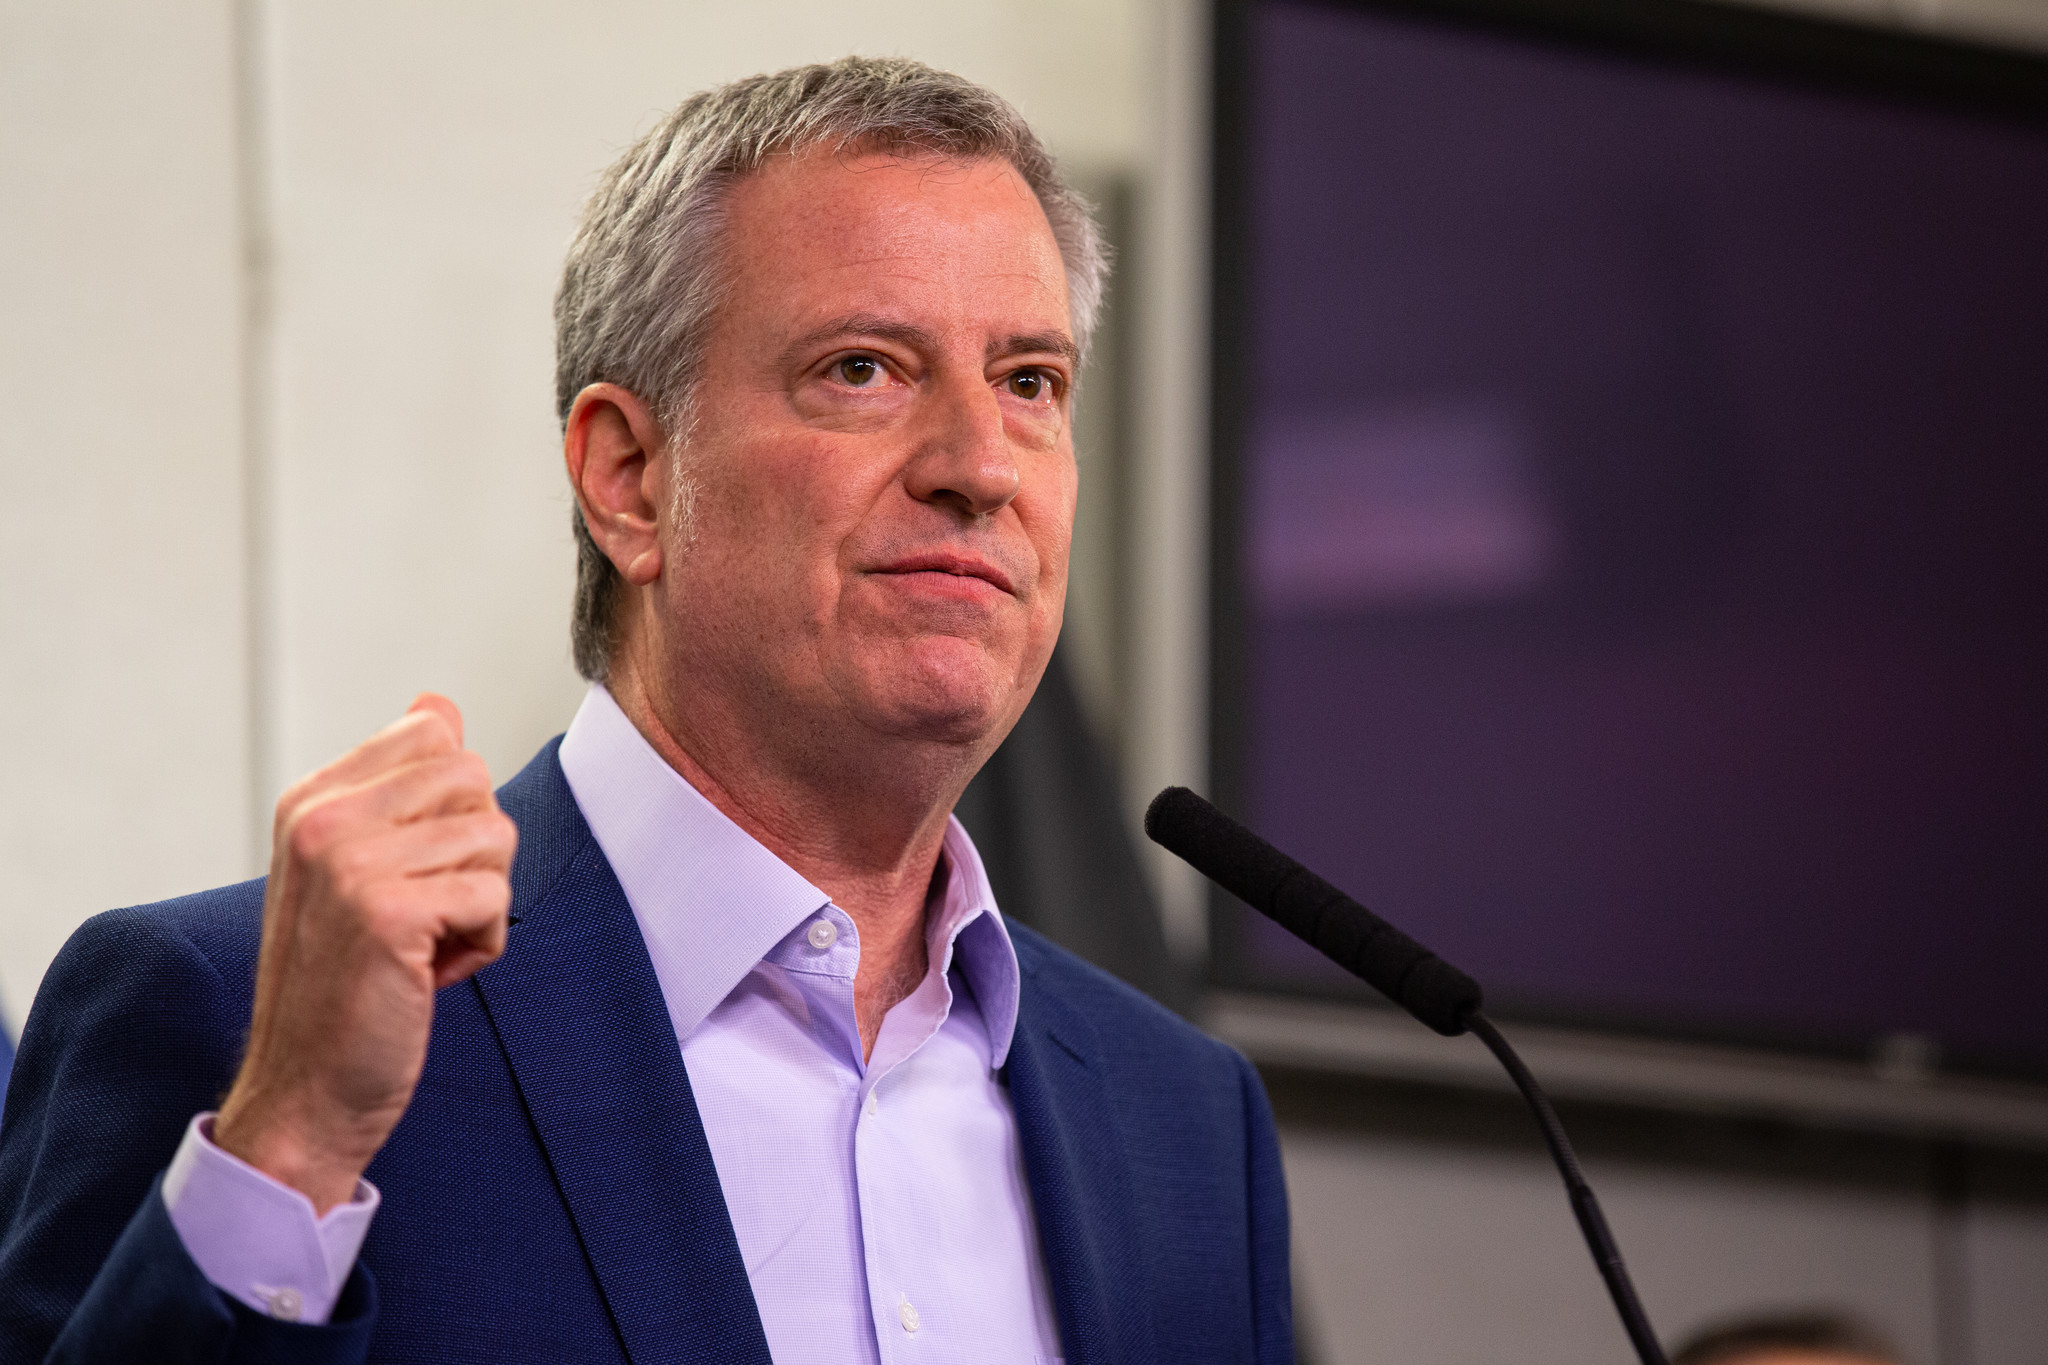 De Blasio calls coronavirus 'many mini-Katrina's' and calls for national mobilization